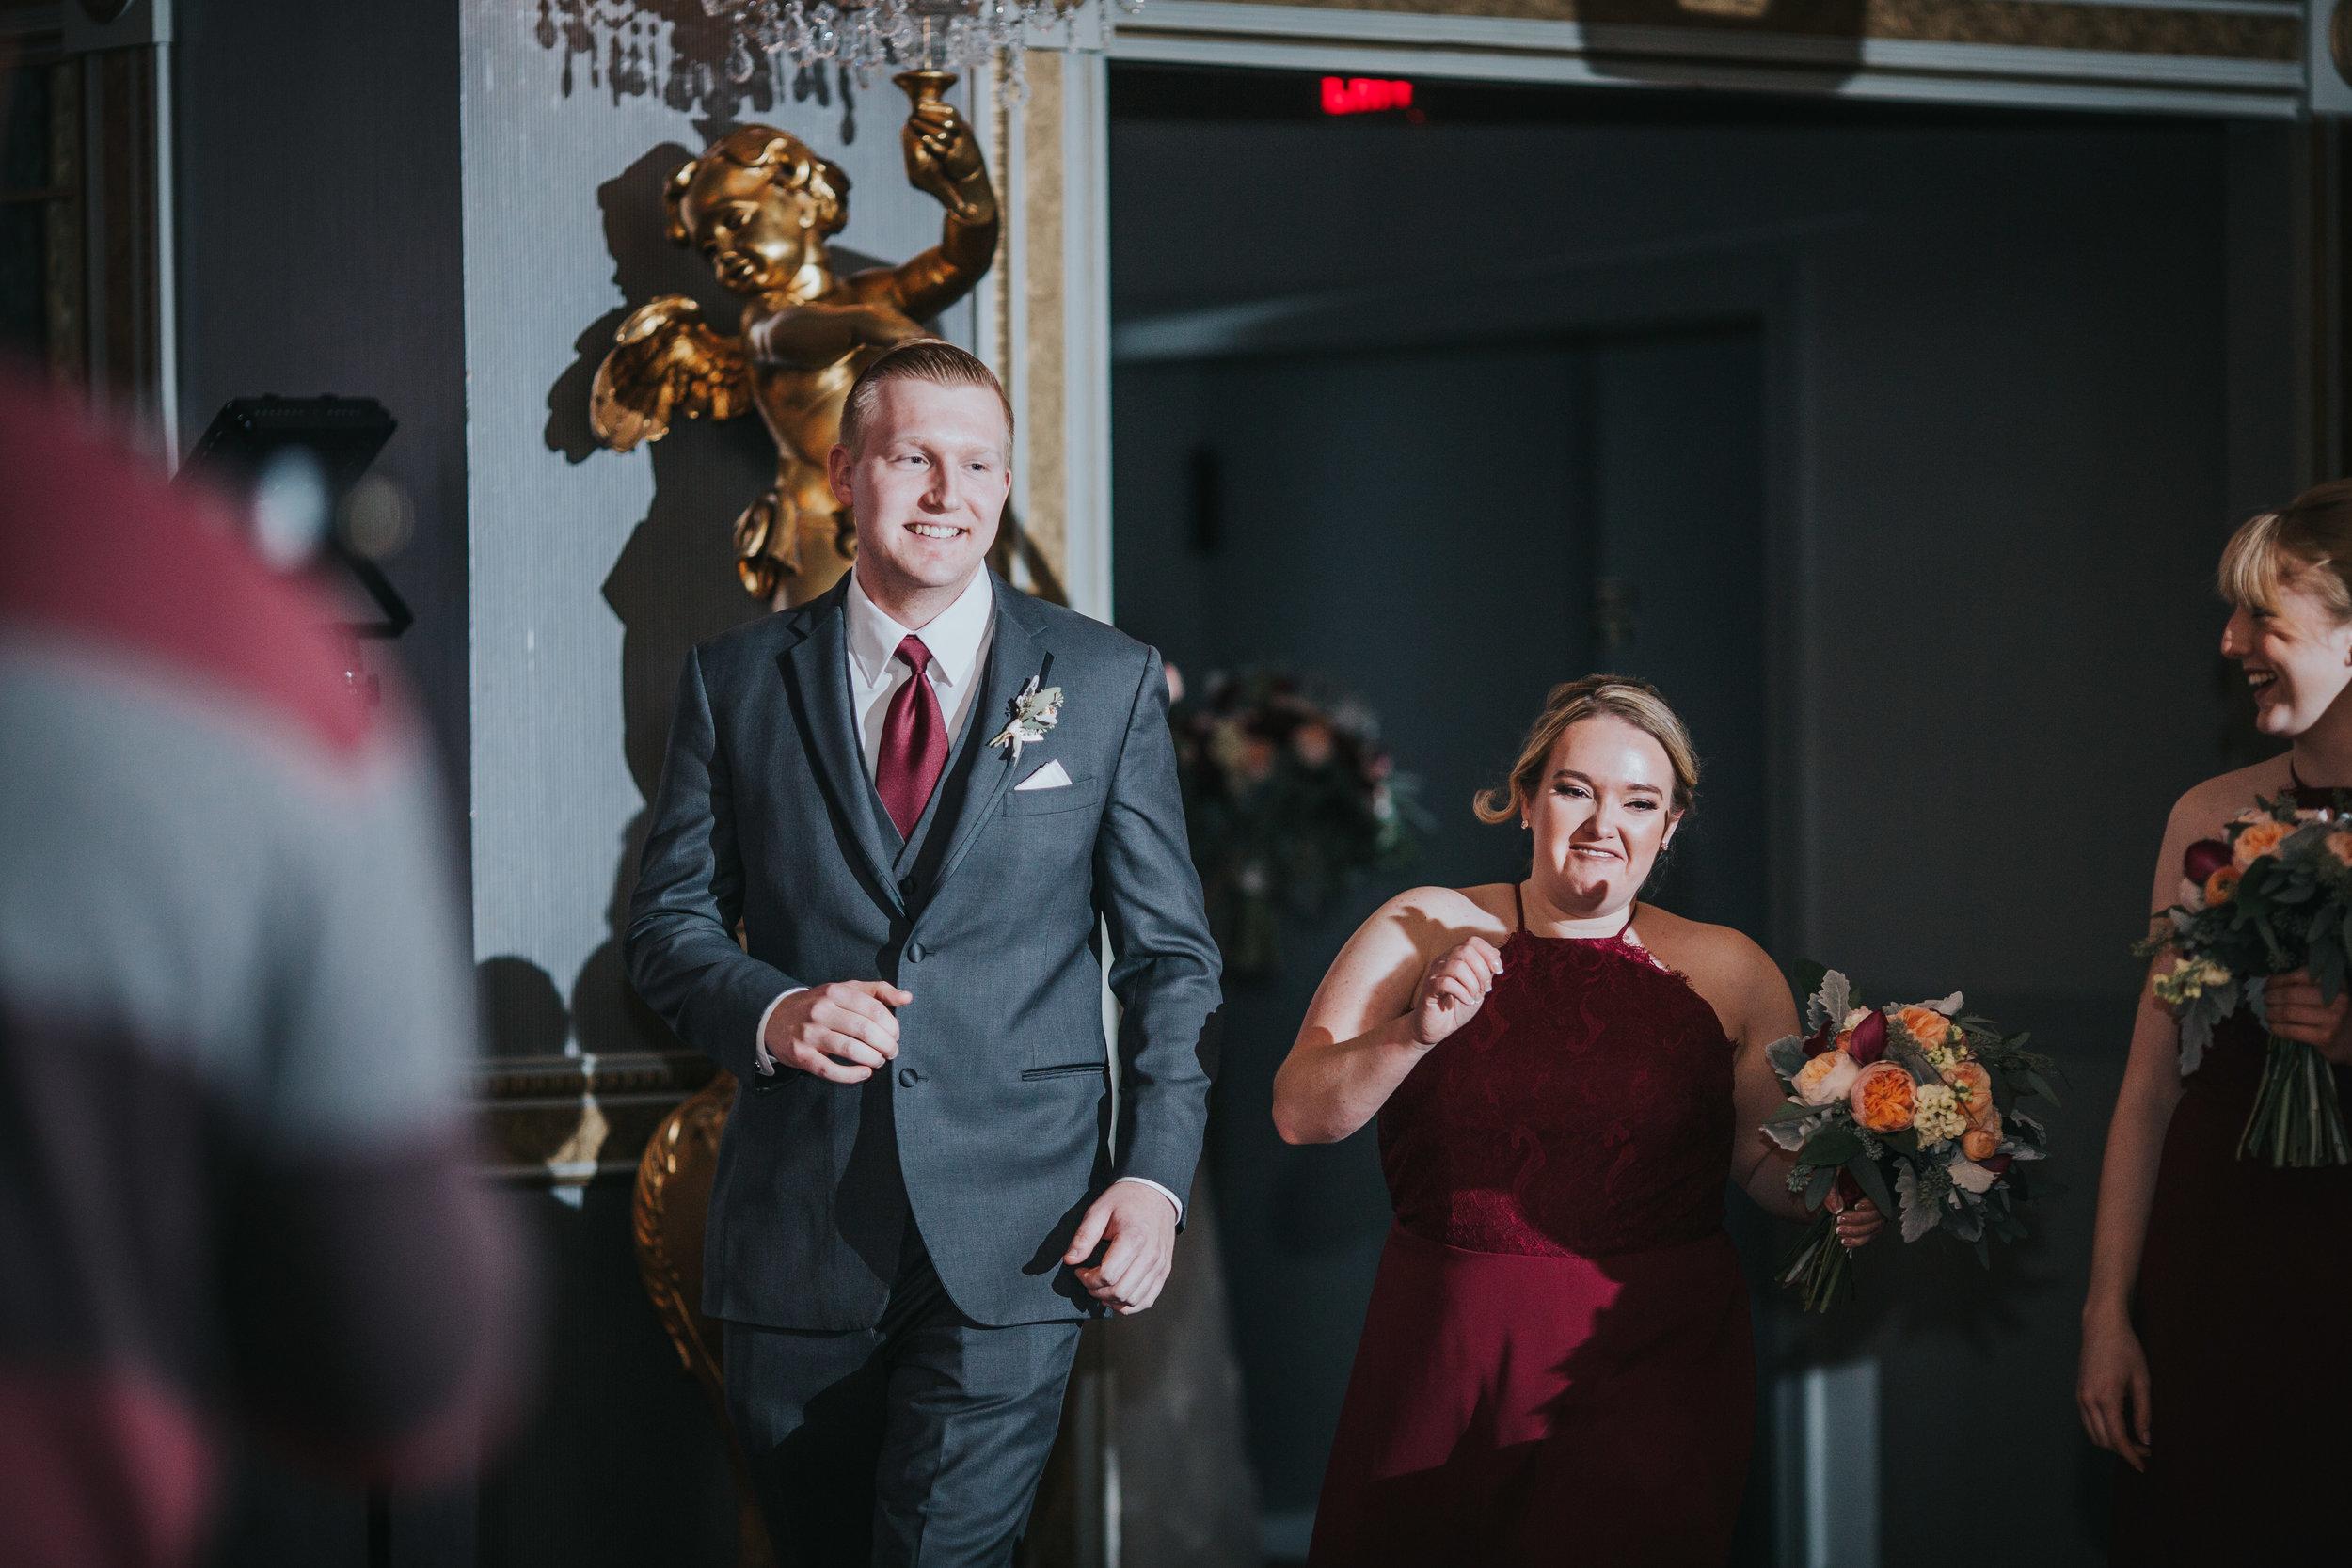 New-Jersey-Wedding-Photography-Fishers-Tudor-House-JennaLynnPhotography-Reception-Kathleen&Eddie-8.jpg